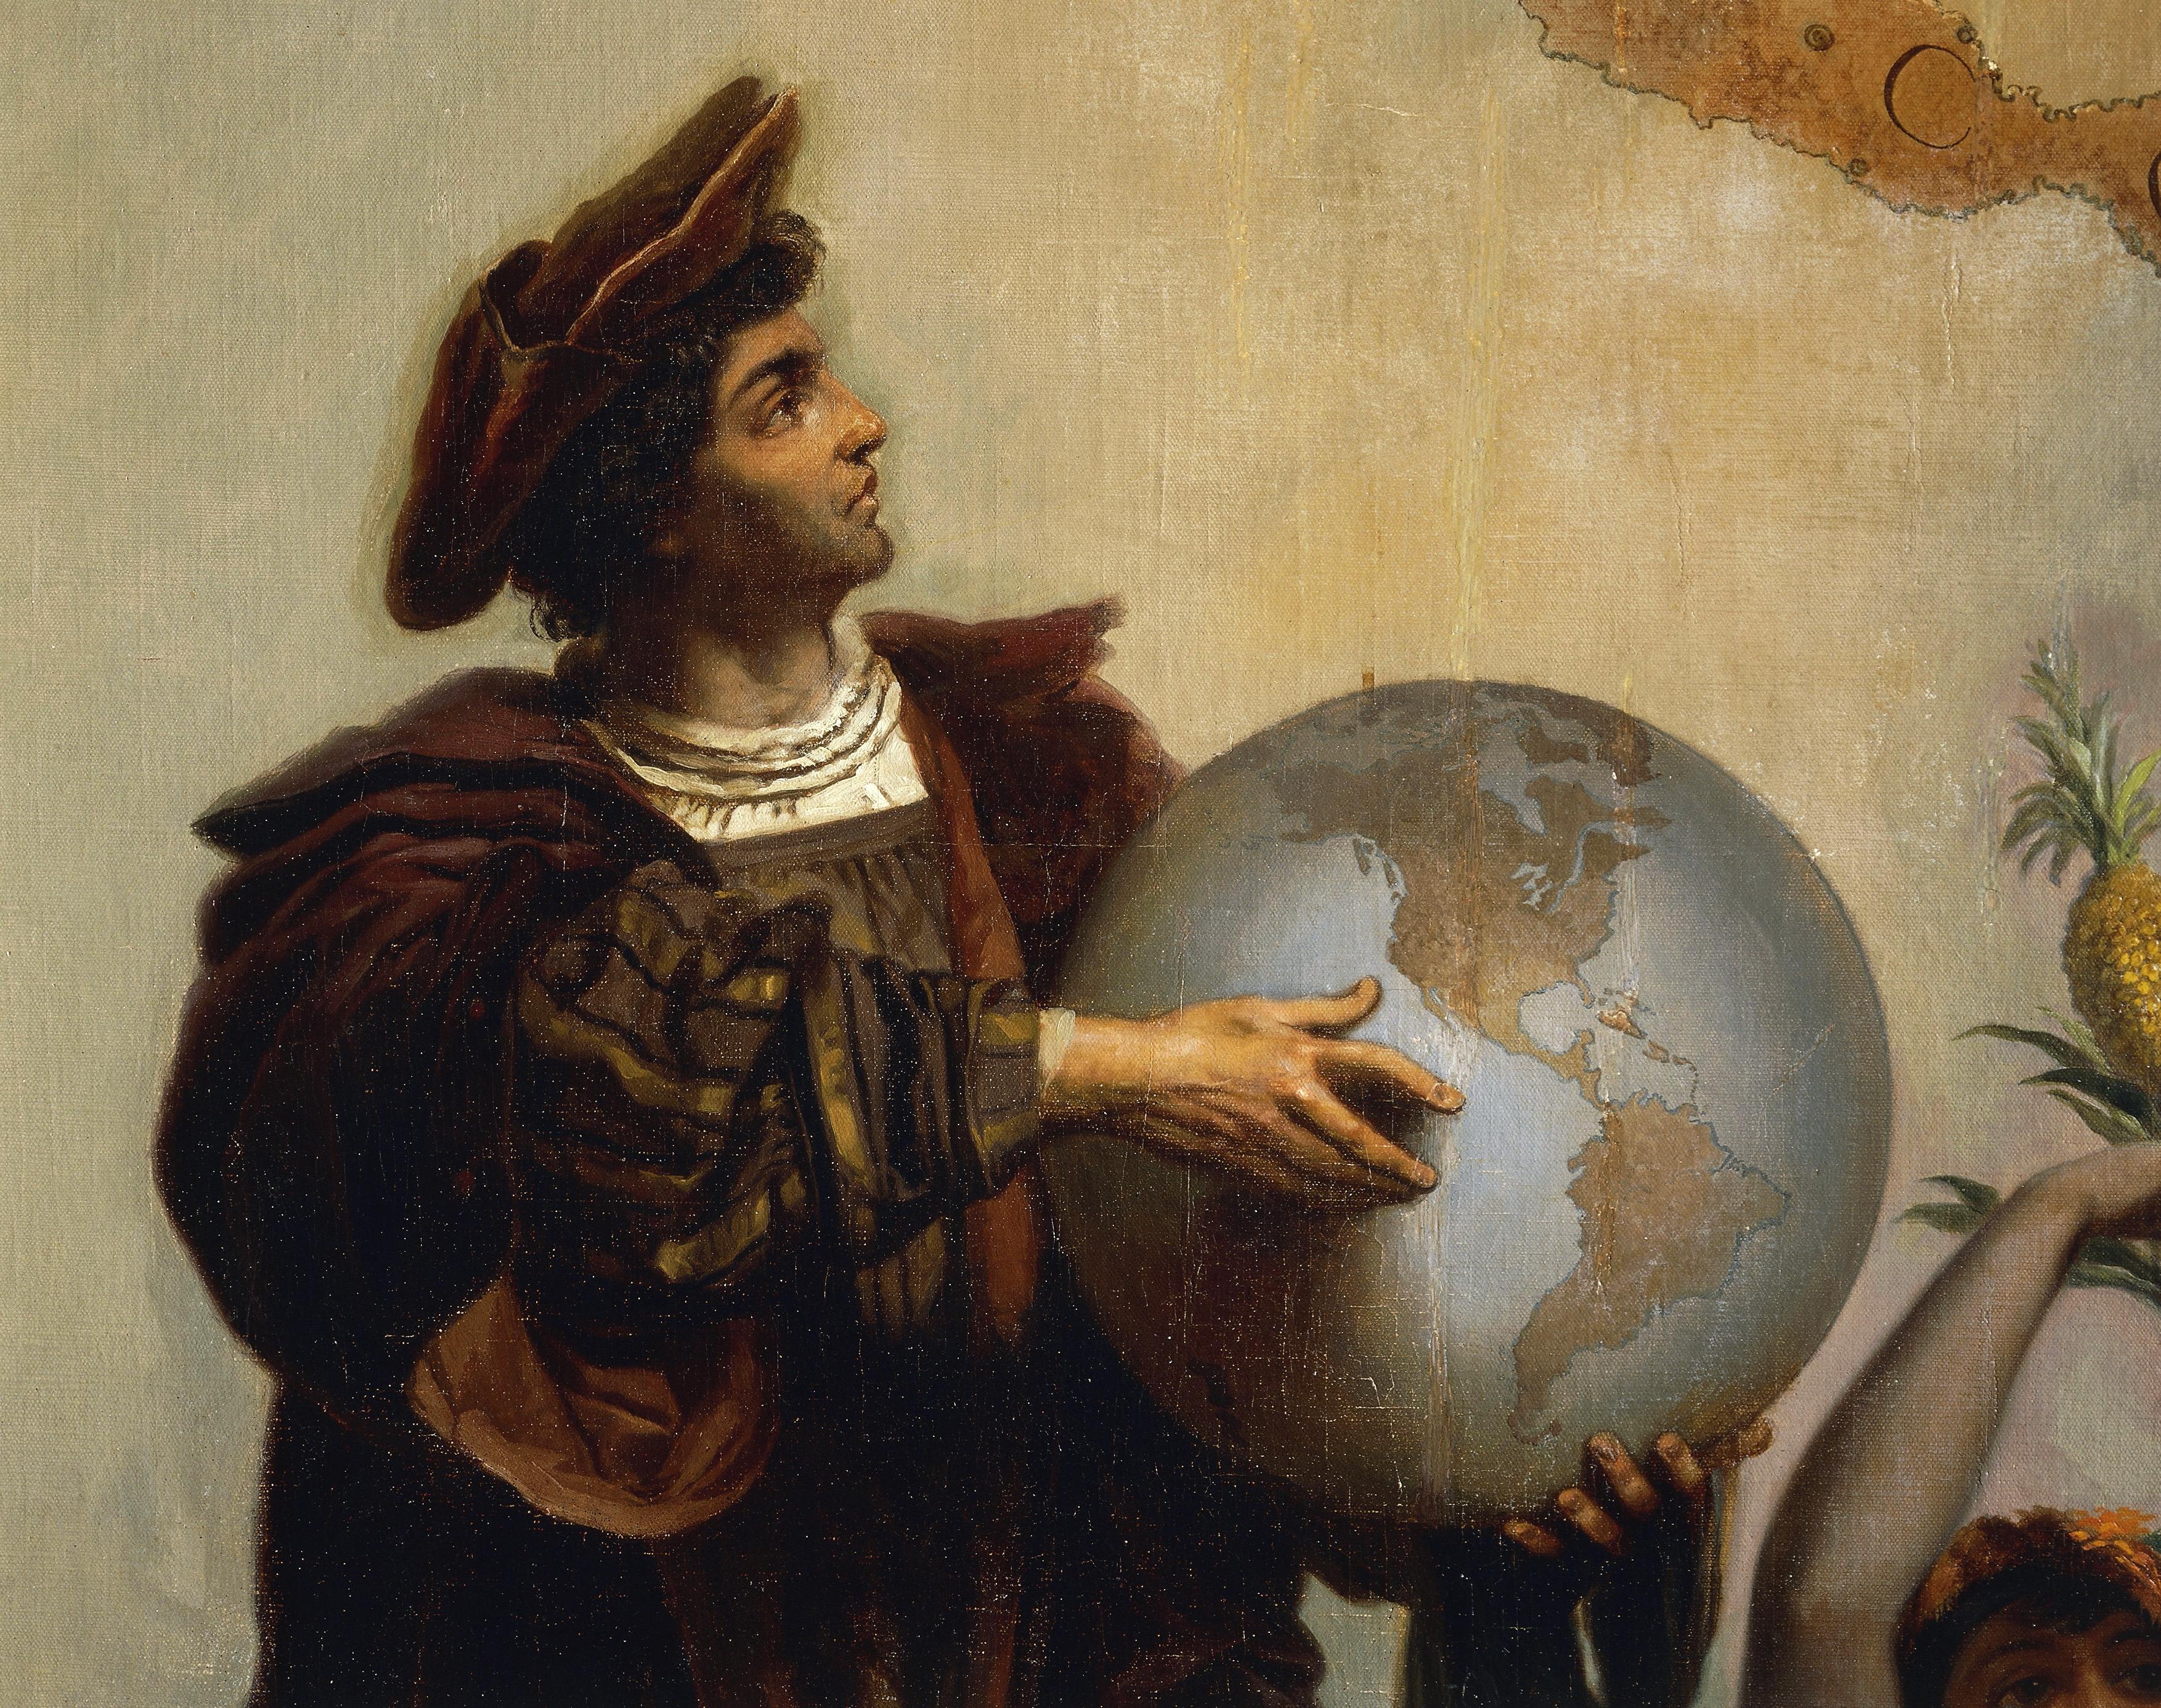 Christopher Columbus (1451-1506), painting by Peter Johann Nepomuk Geiger (1805-1880).